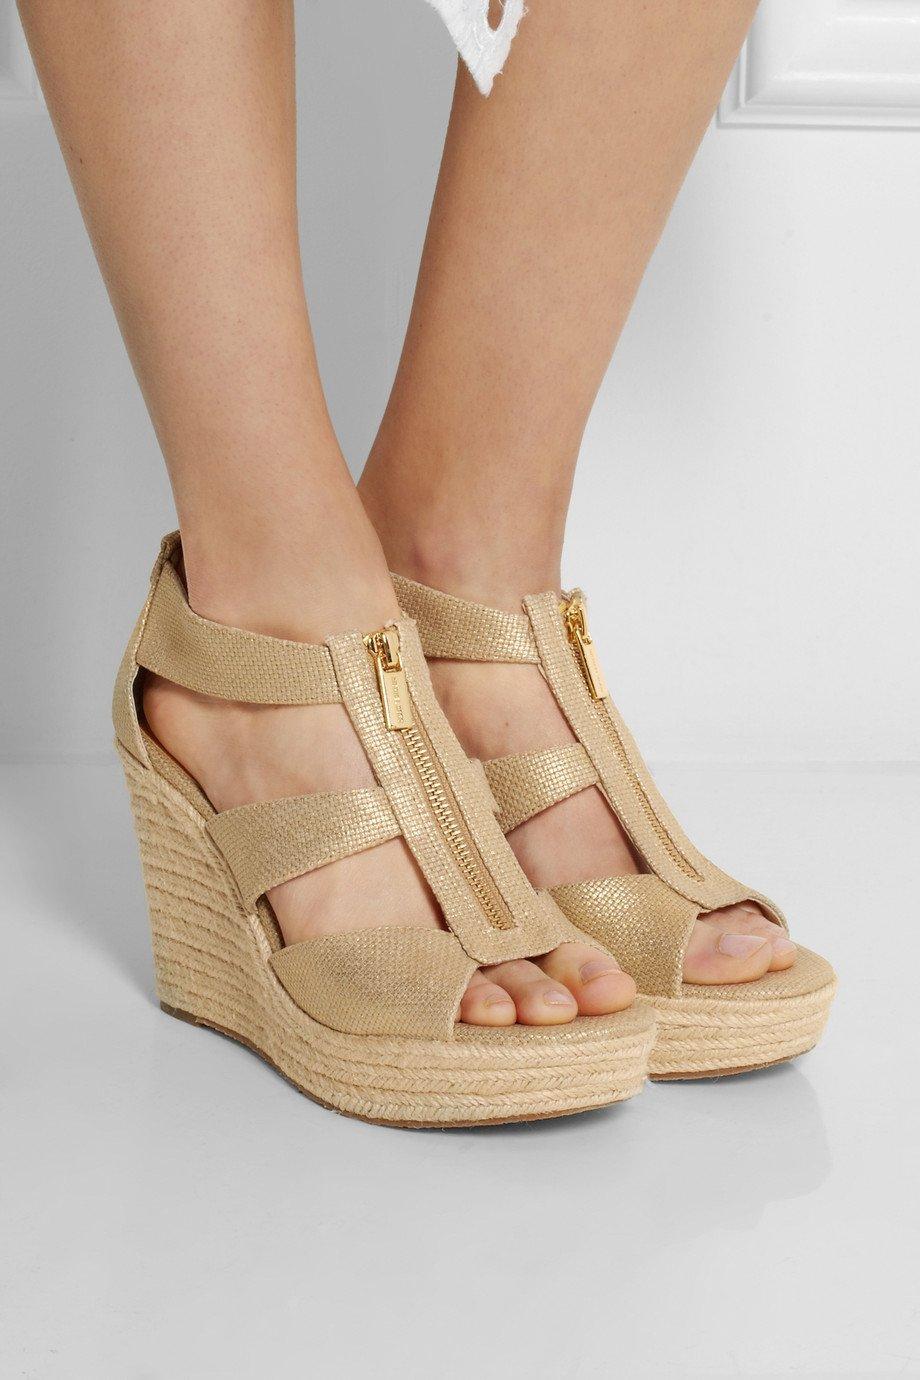 58233375e311 MICHAEL Michael Kors Damita Metallic Canvas Wedge Sandals in ...